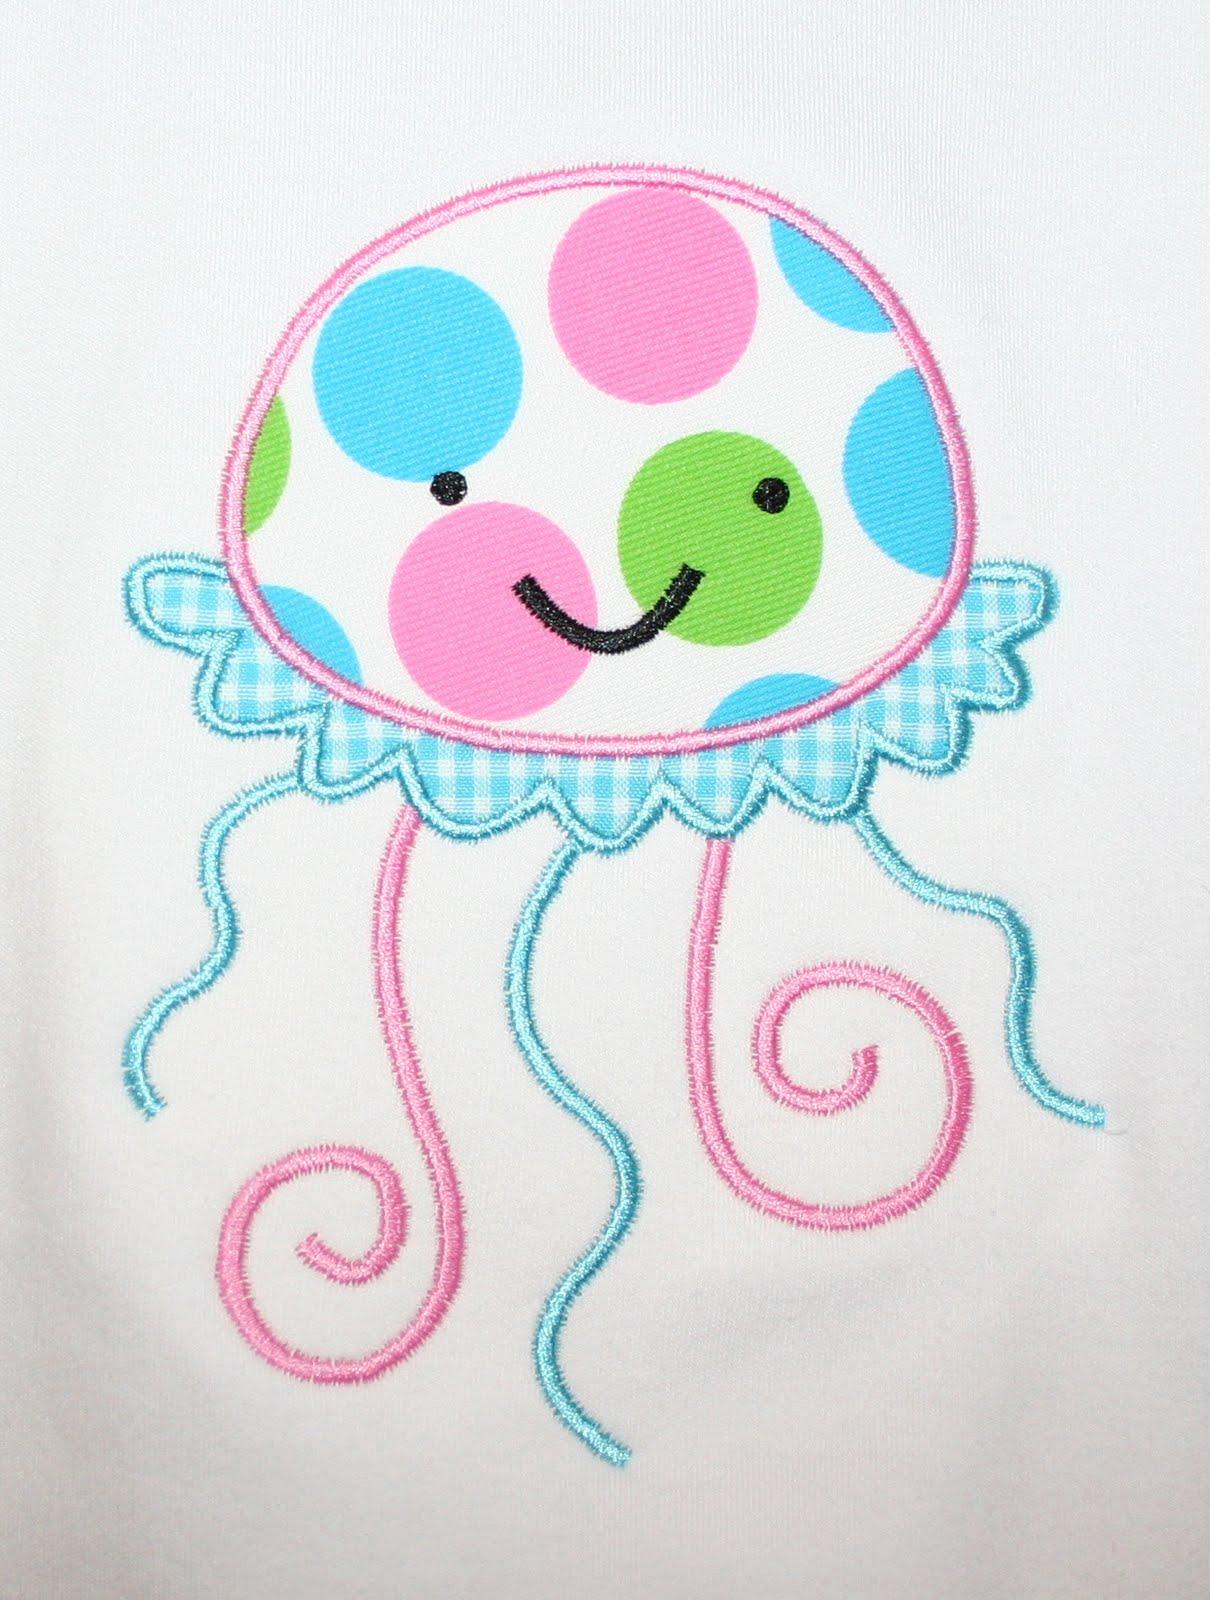 shirts sew cute  applique designs